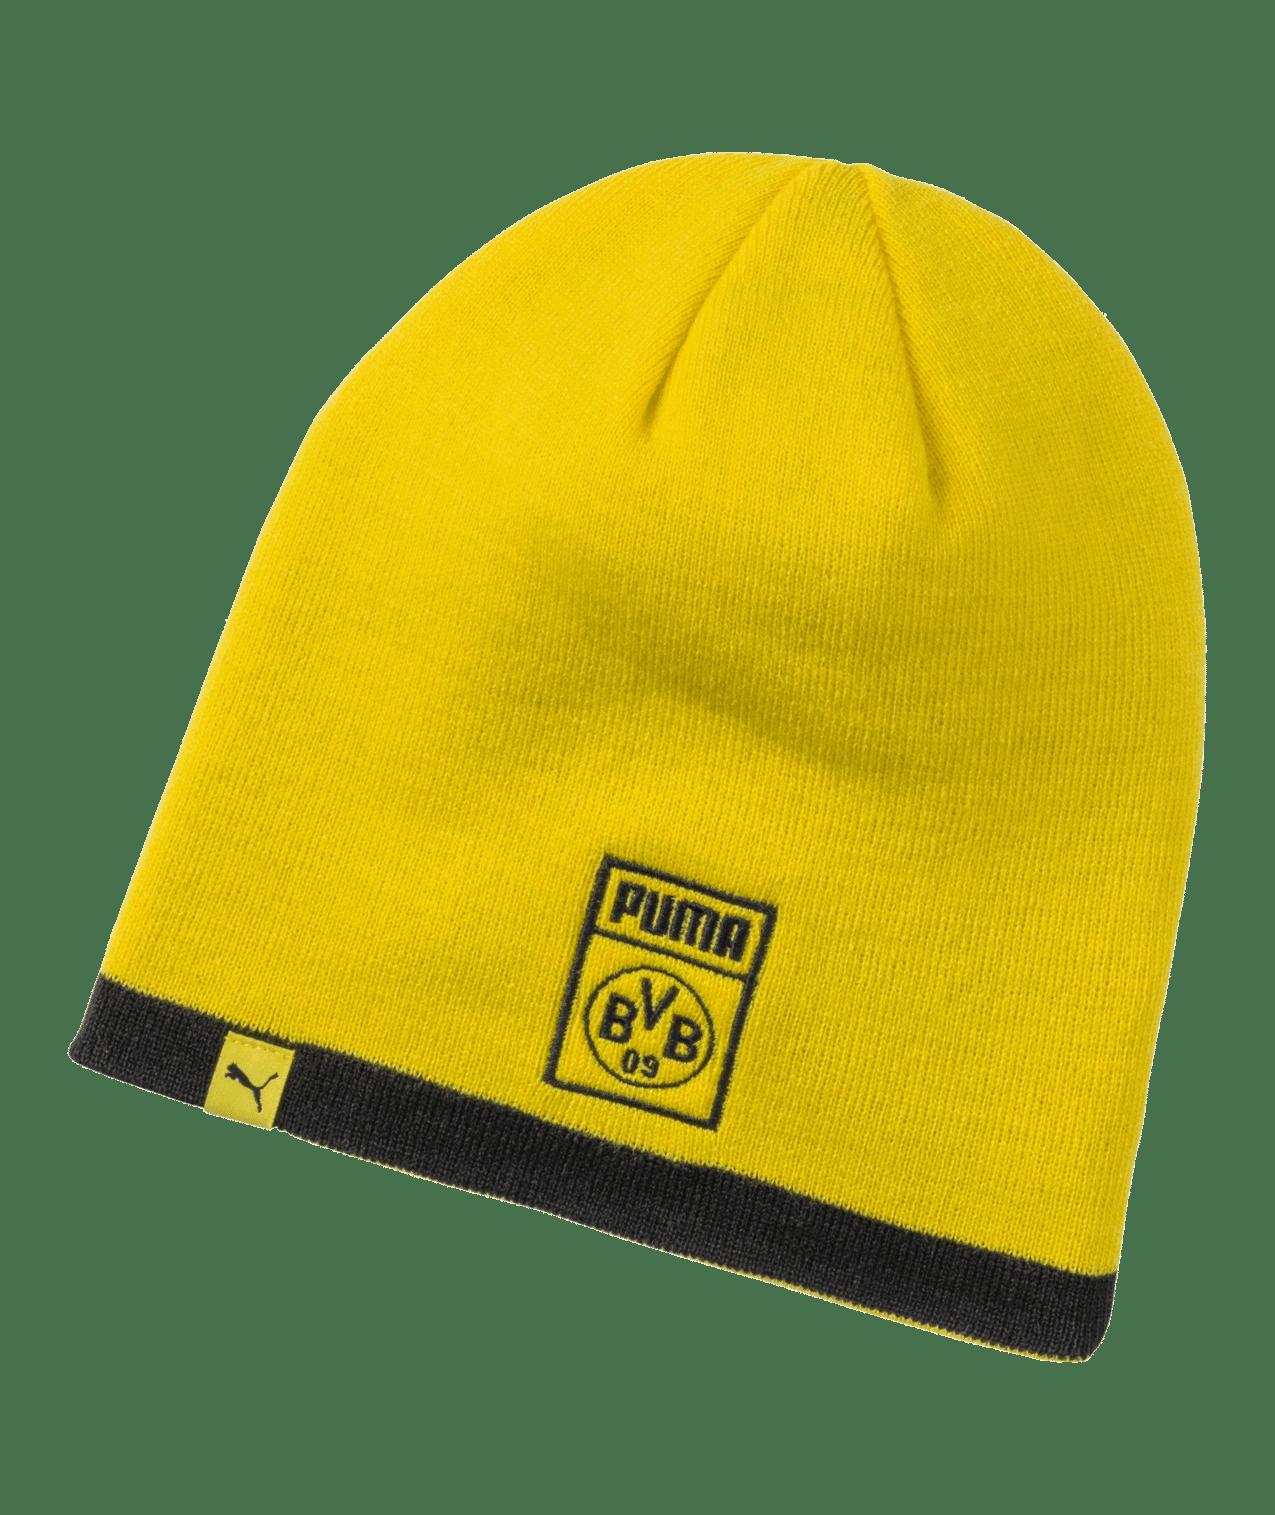 3760deb0 Hats Archives - Motor City Soccer